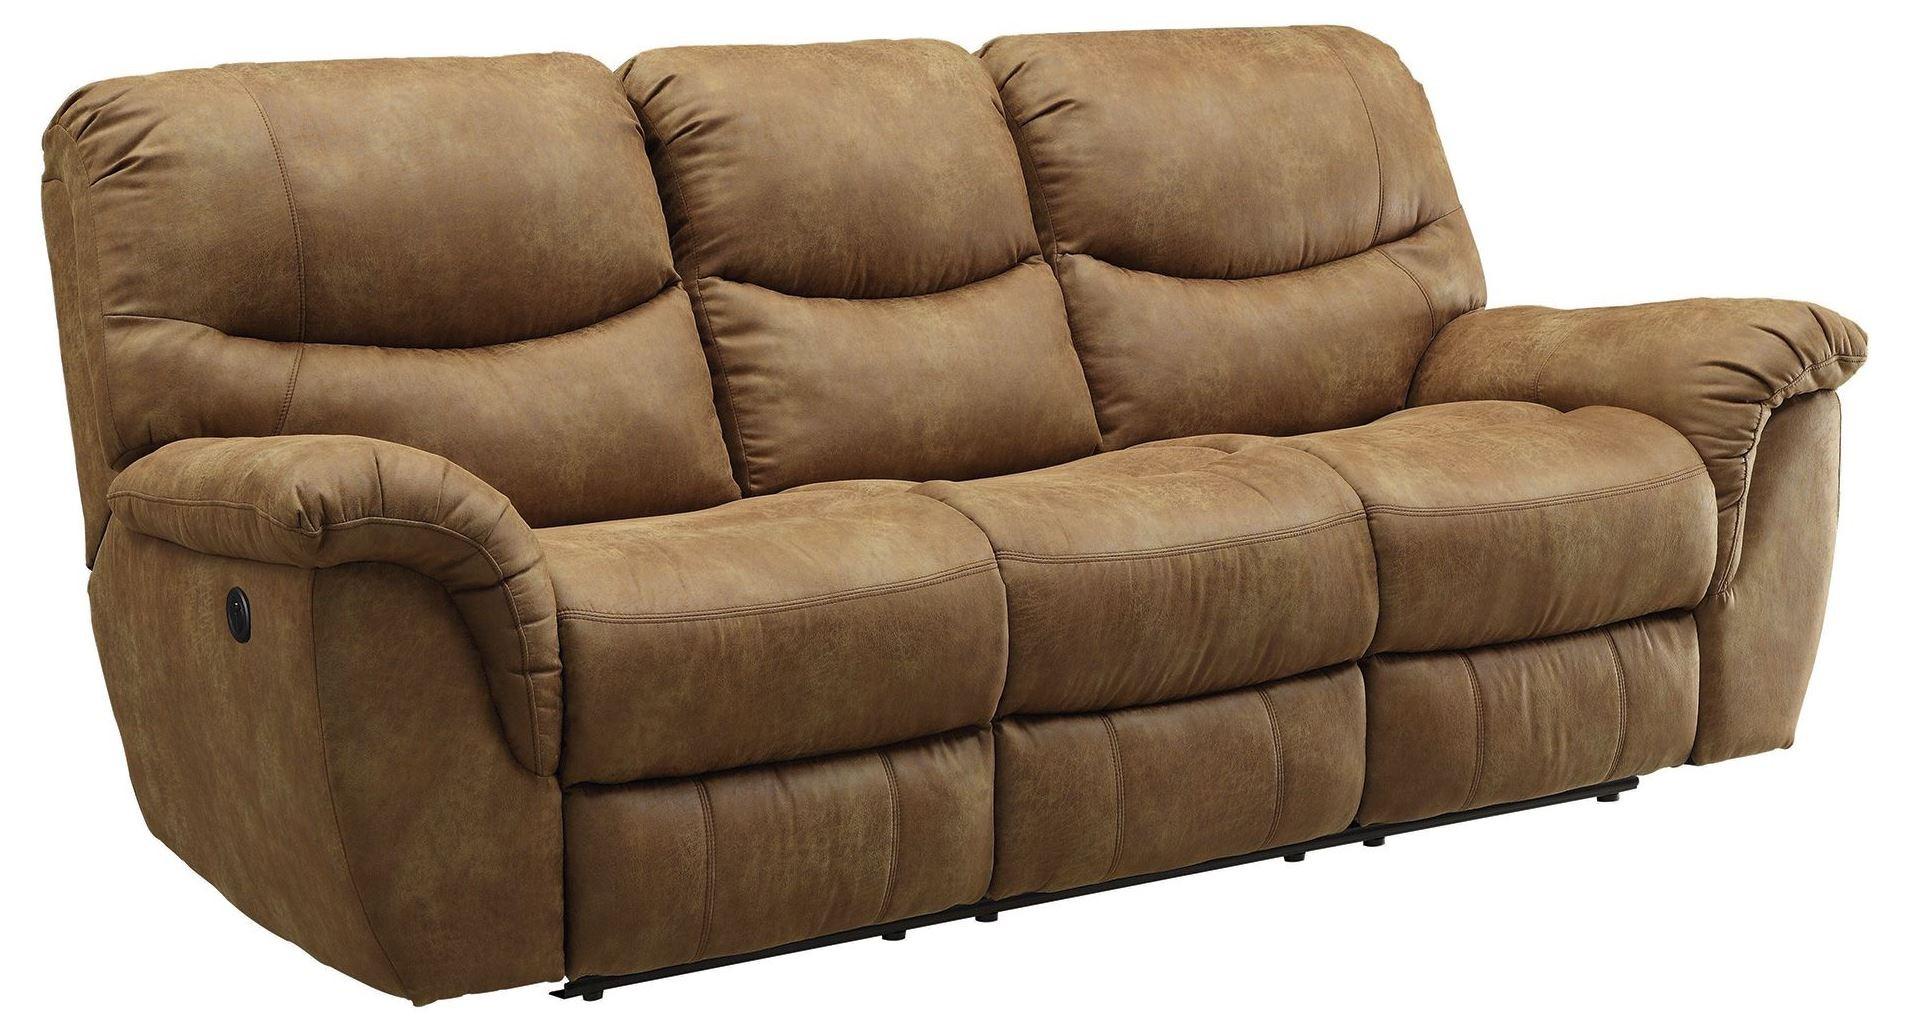 Hancox Light Brown Power Reclining Sofa from Coaster